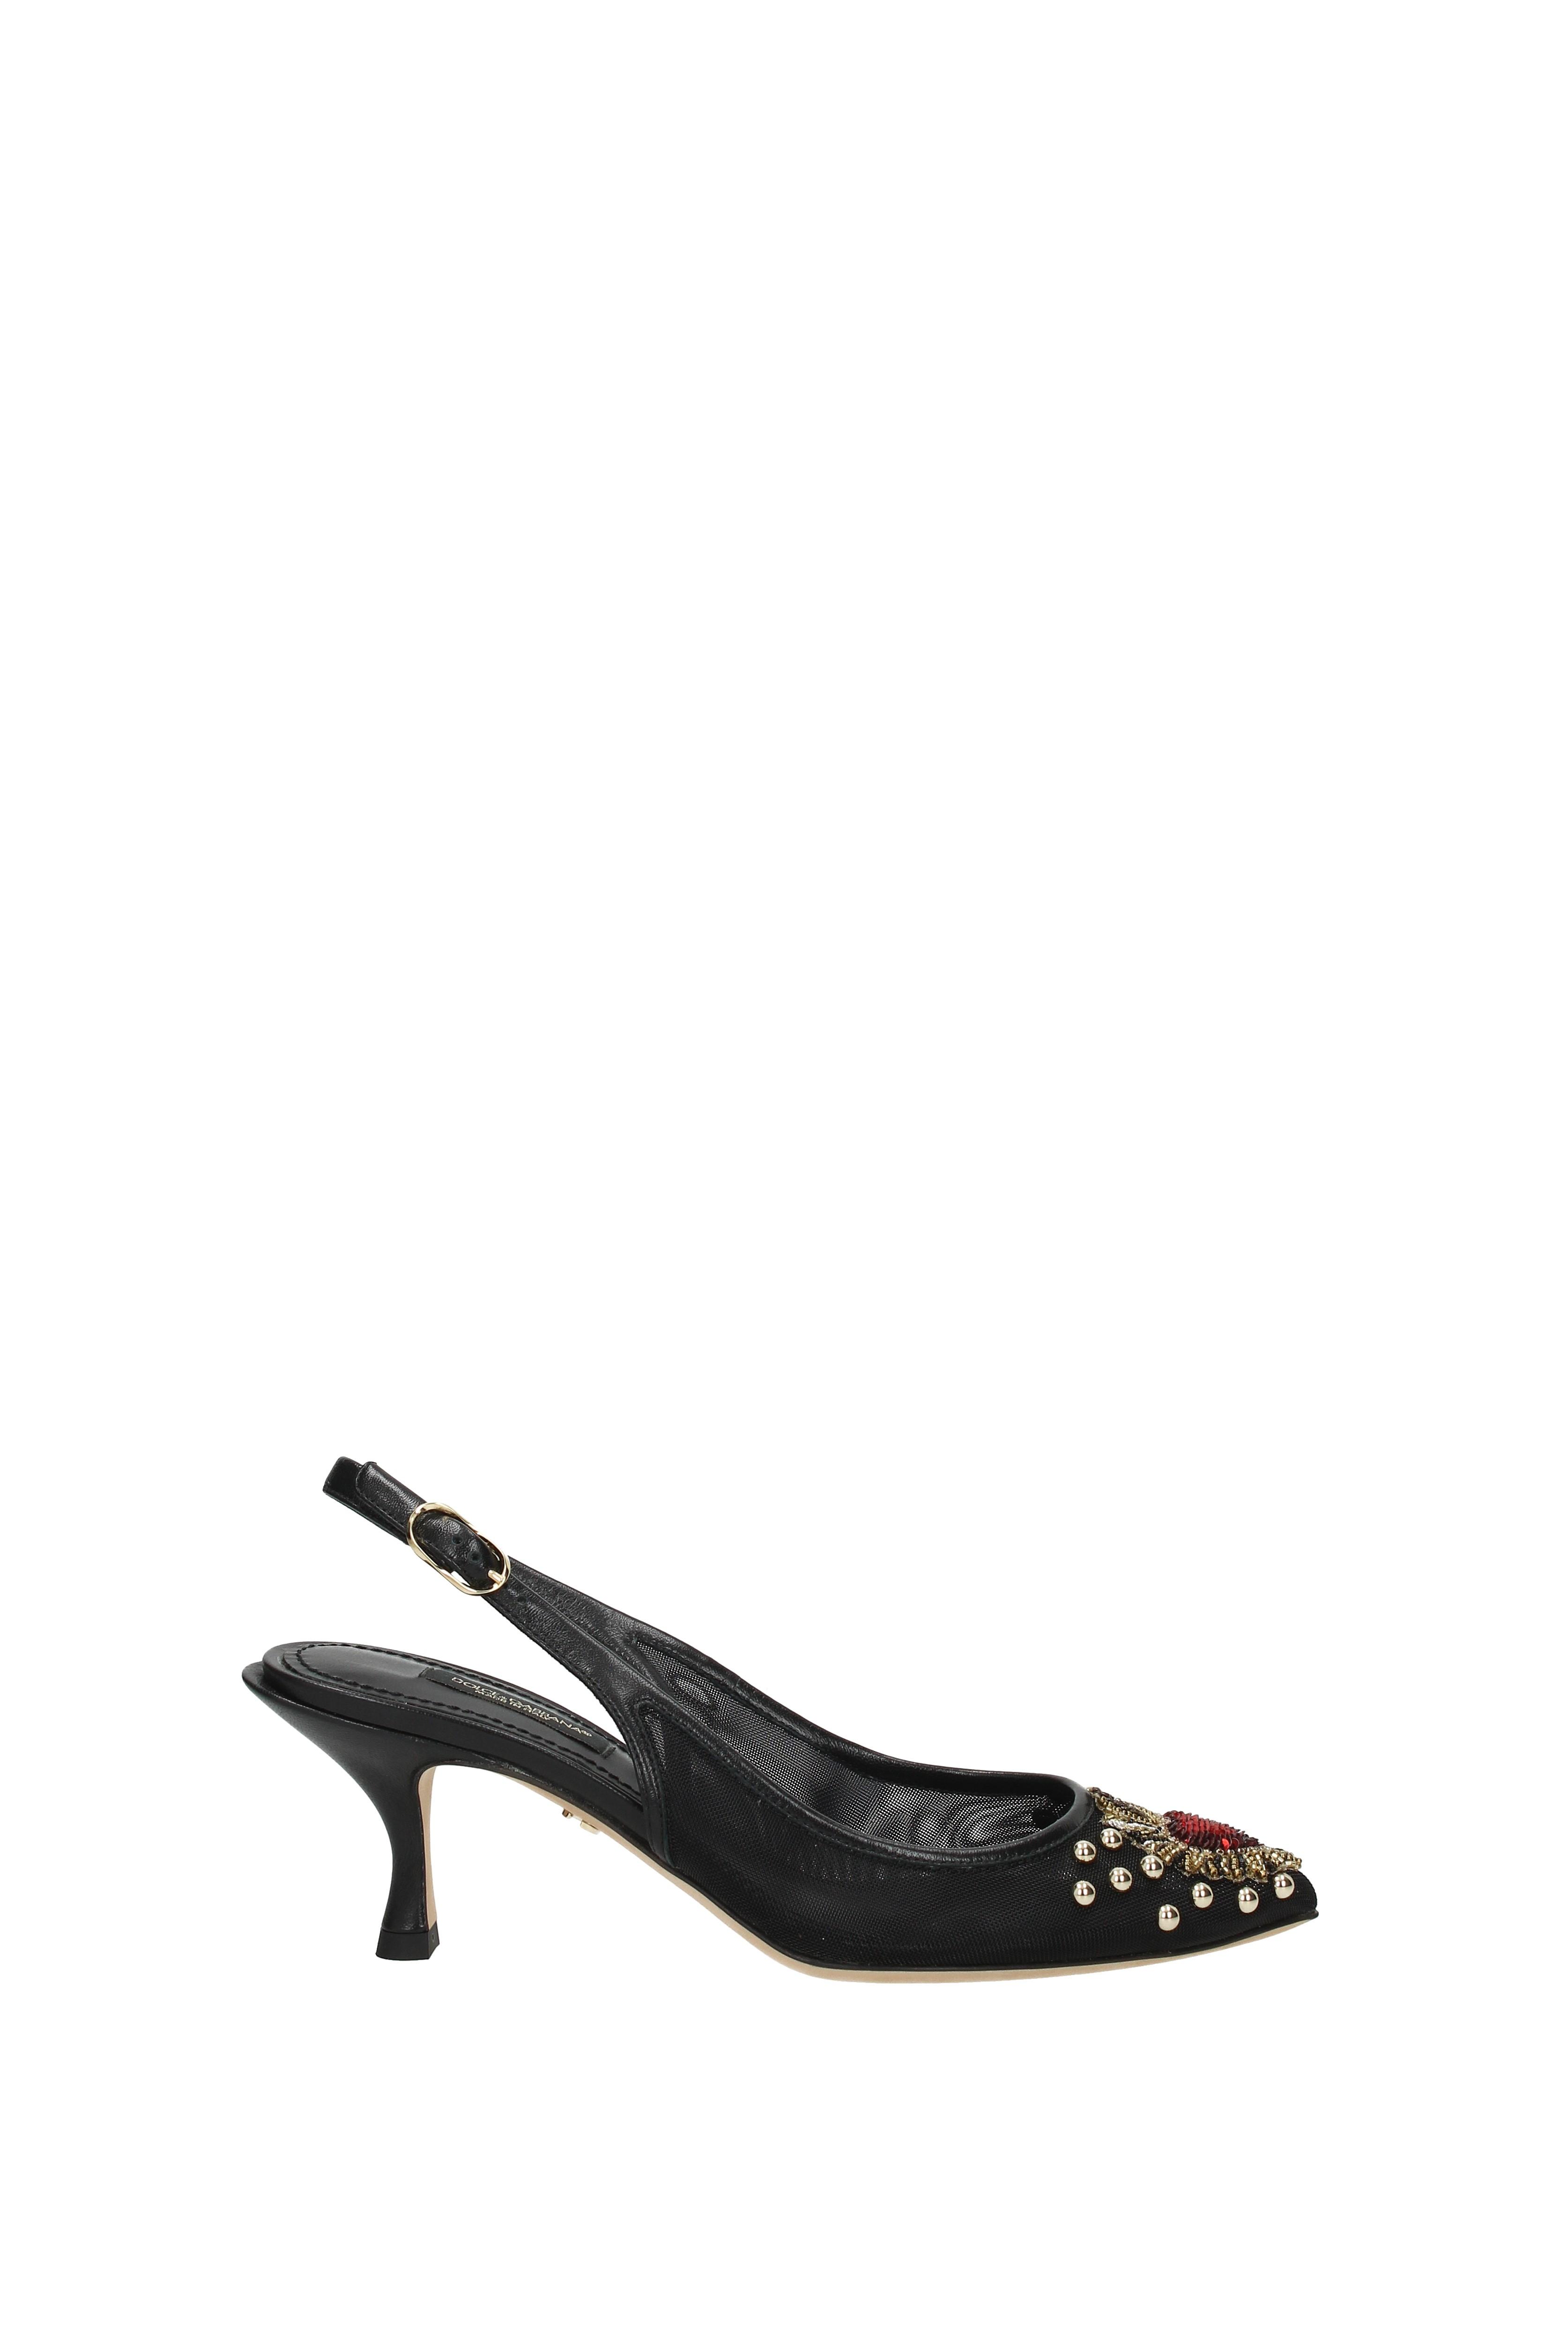 Sandals Dolce&Gabbana lori Women - (CG0247AS789) Fabric  (CG0247AS789) - a5fb2e